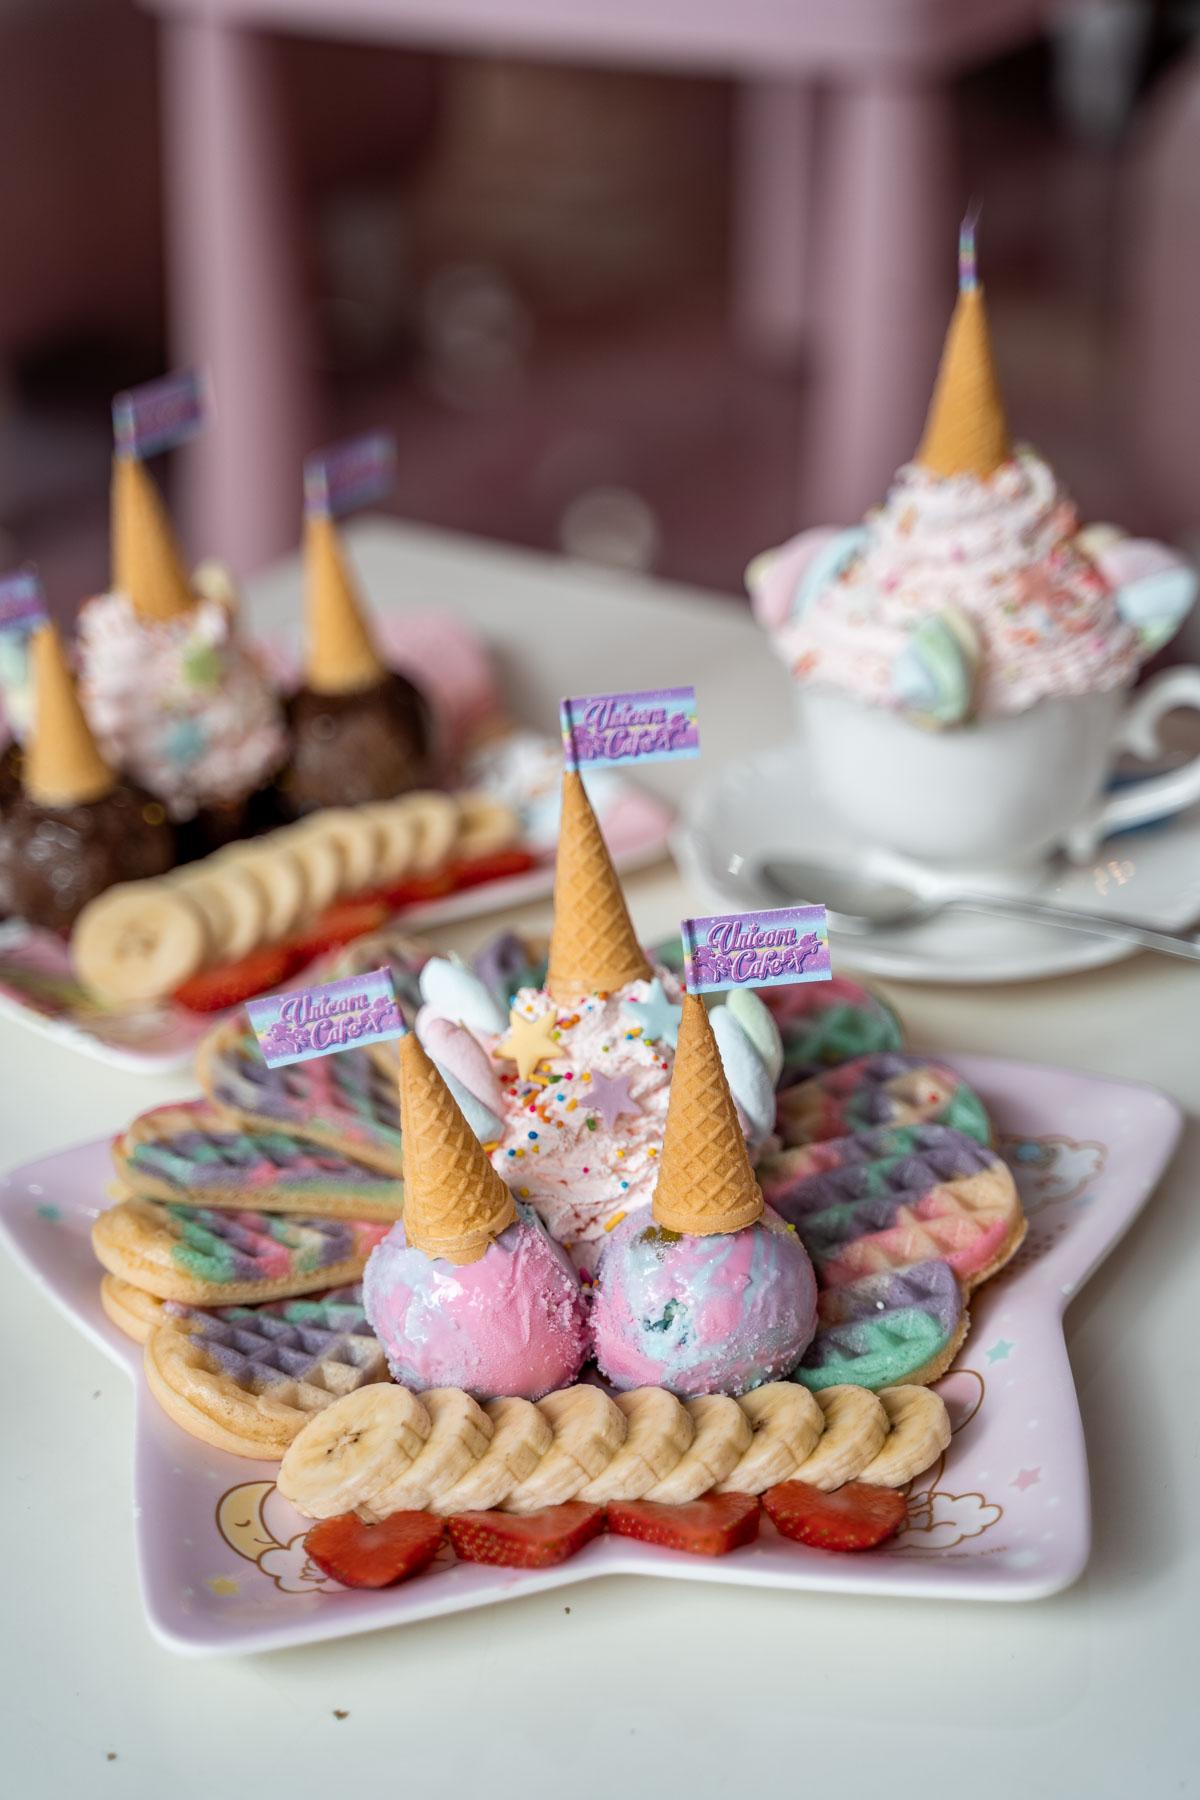 Rainbow waffles and cotton candy milkshake at the Unicorn Cafe in Bangkok